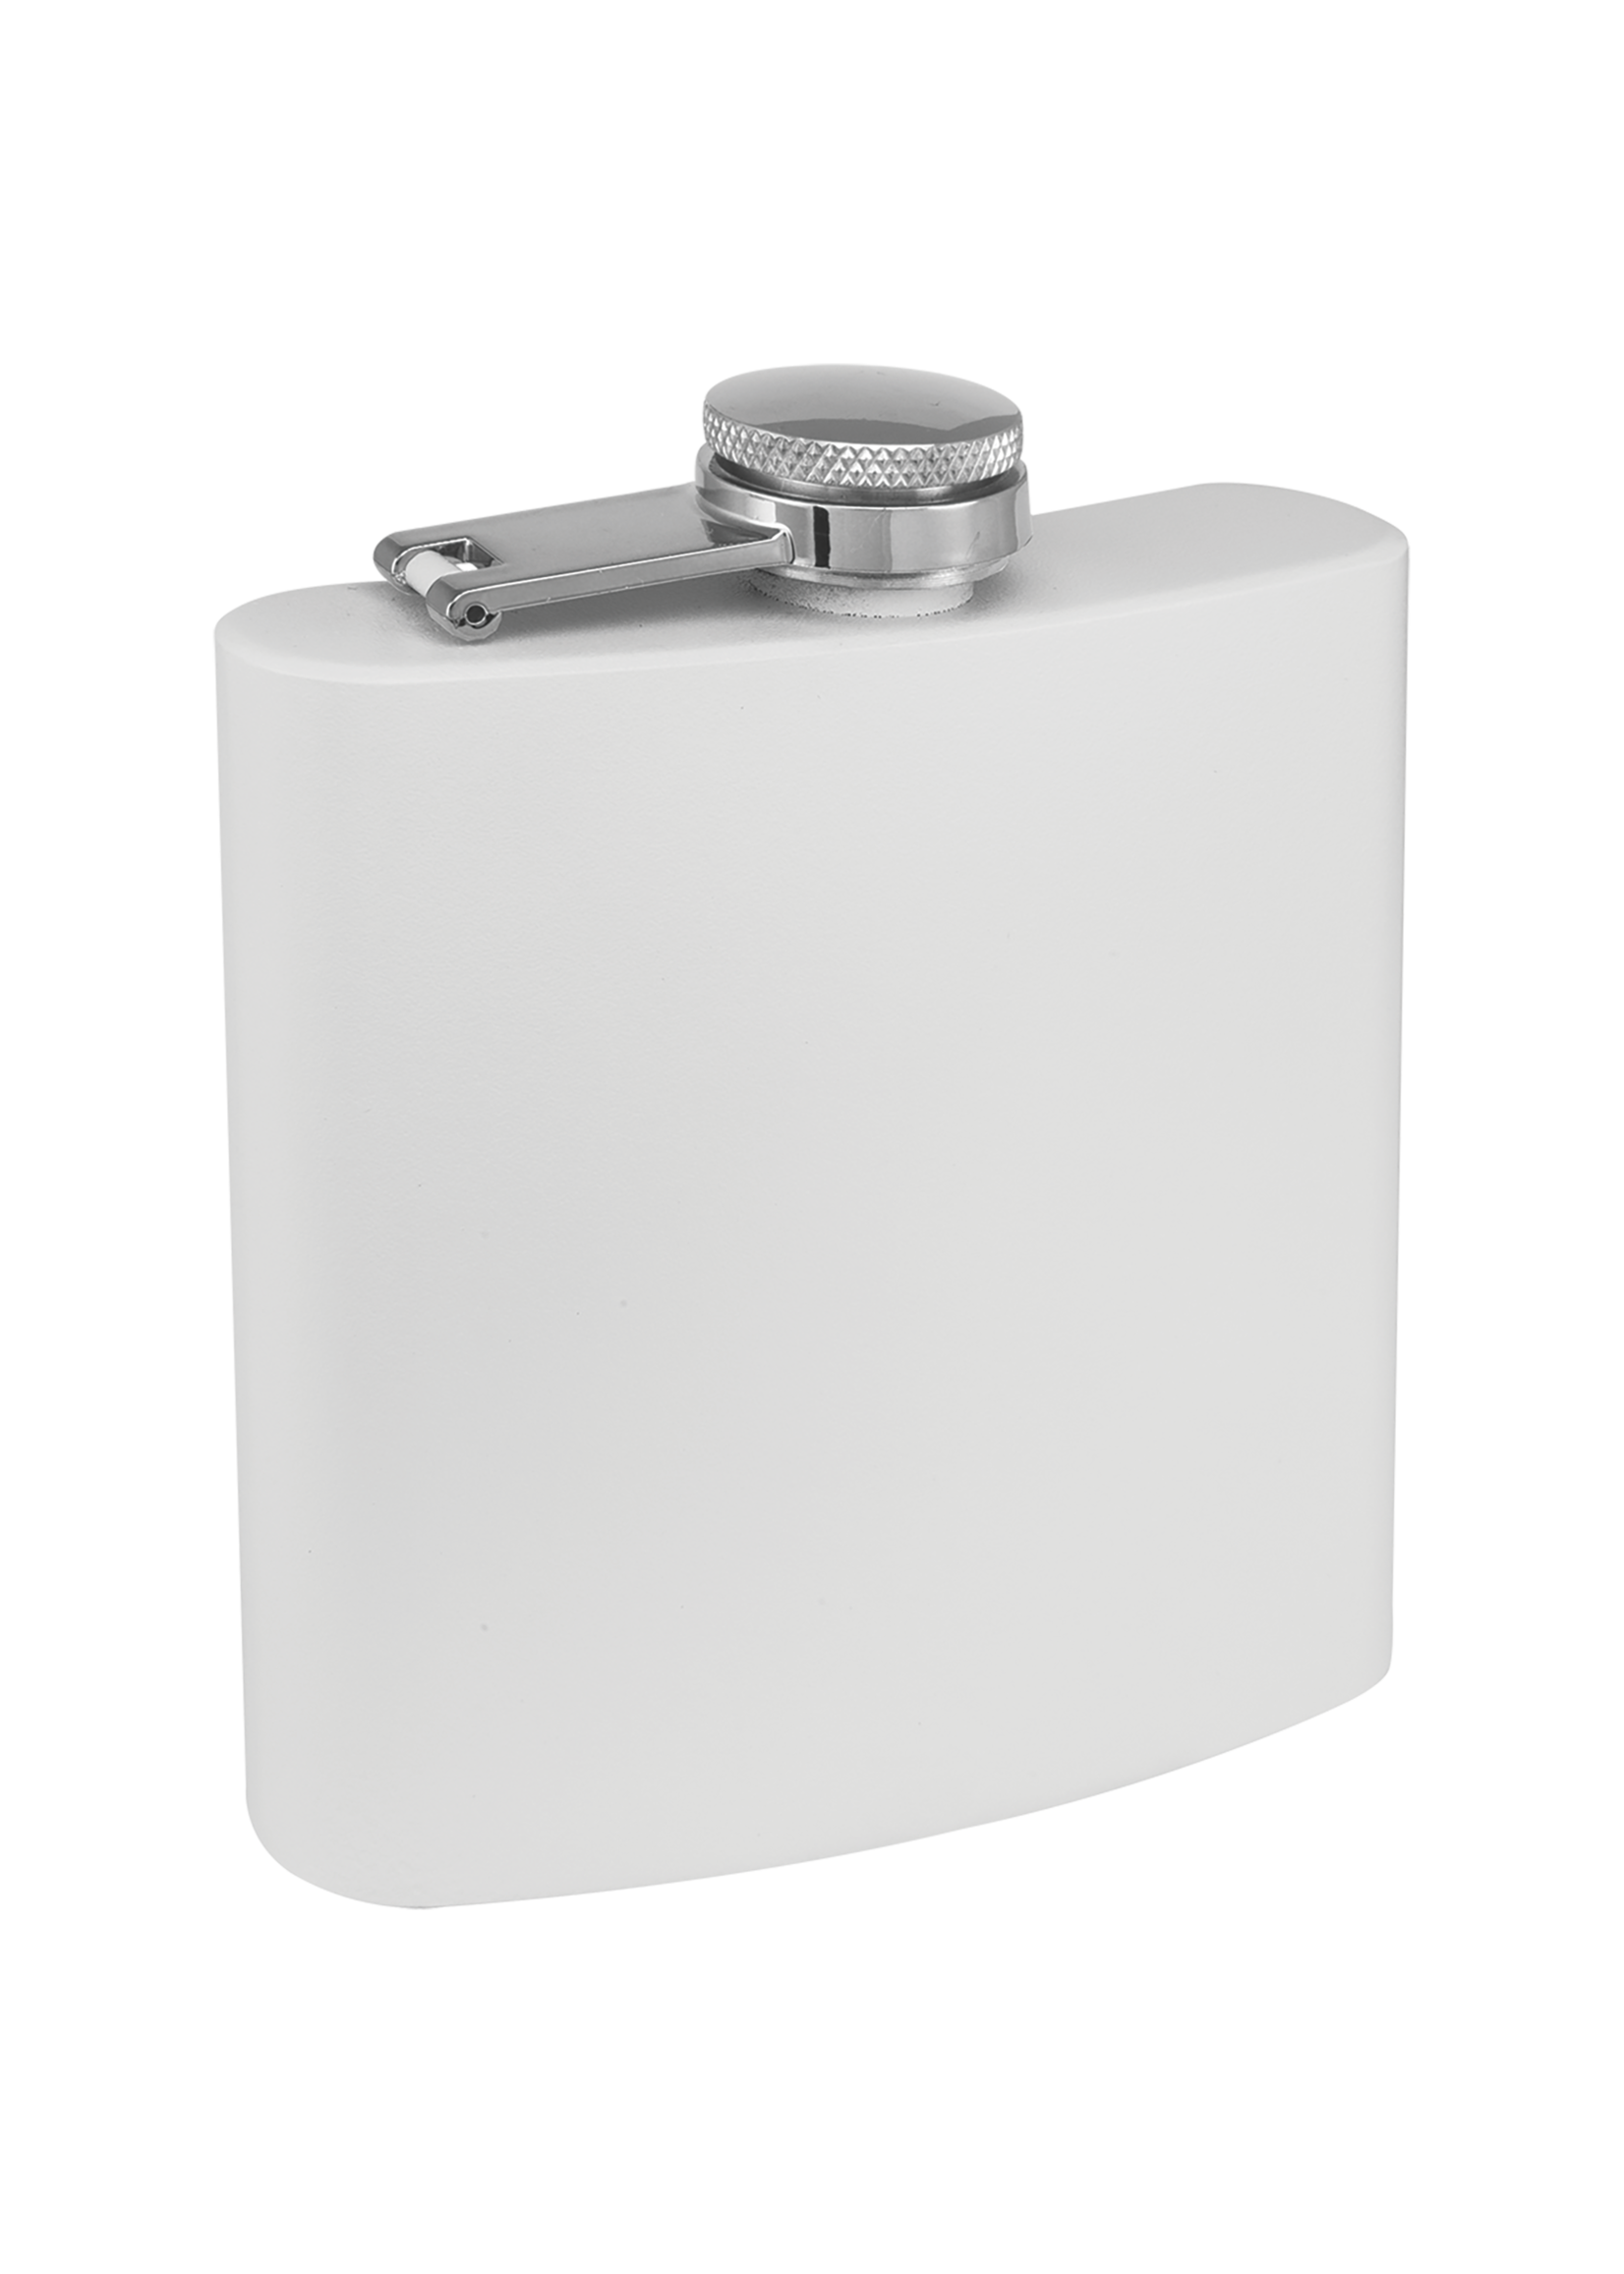 6 oz Flask Powder Coated